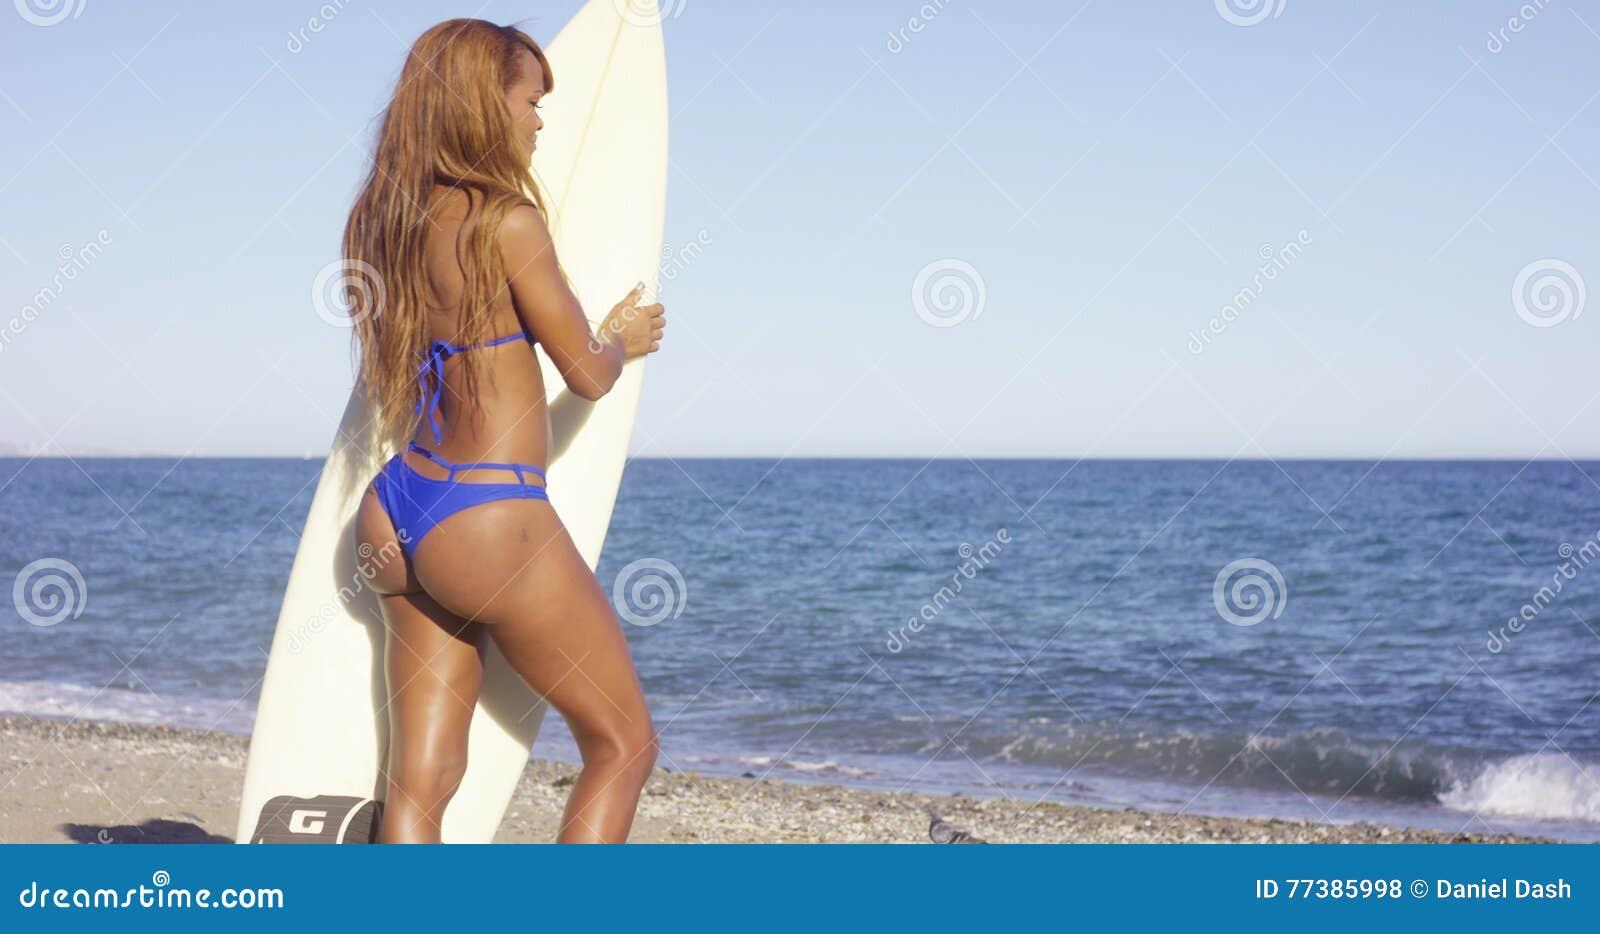 Rear View Of Woman In Bikini Holding Surfing Board Stock